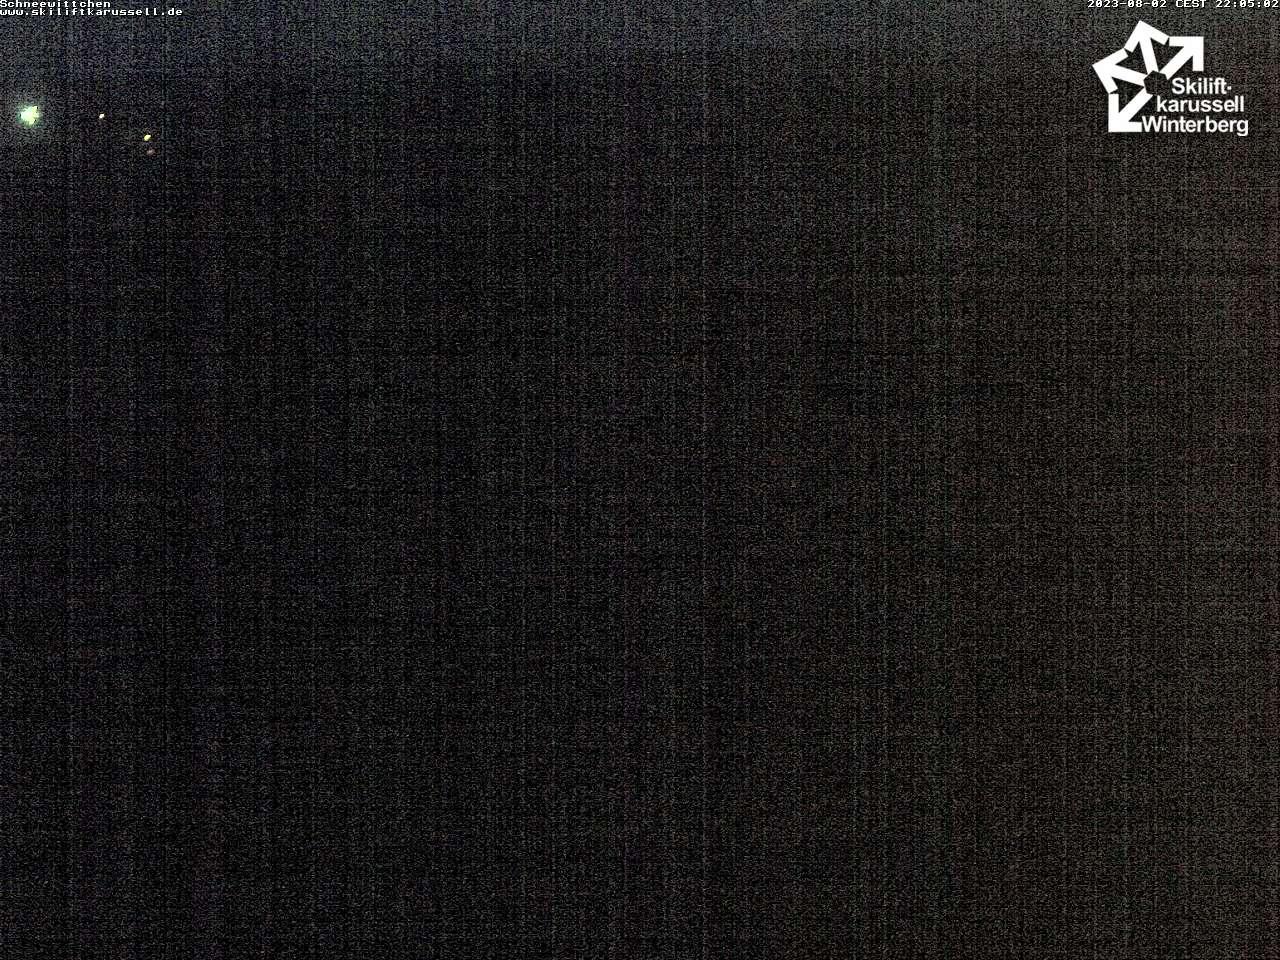 Schneewittchenhang, Winterberg